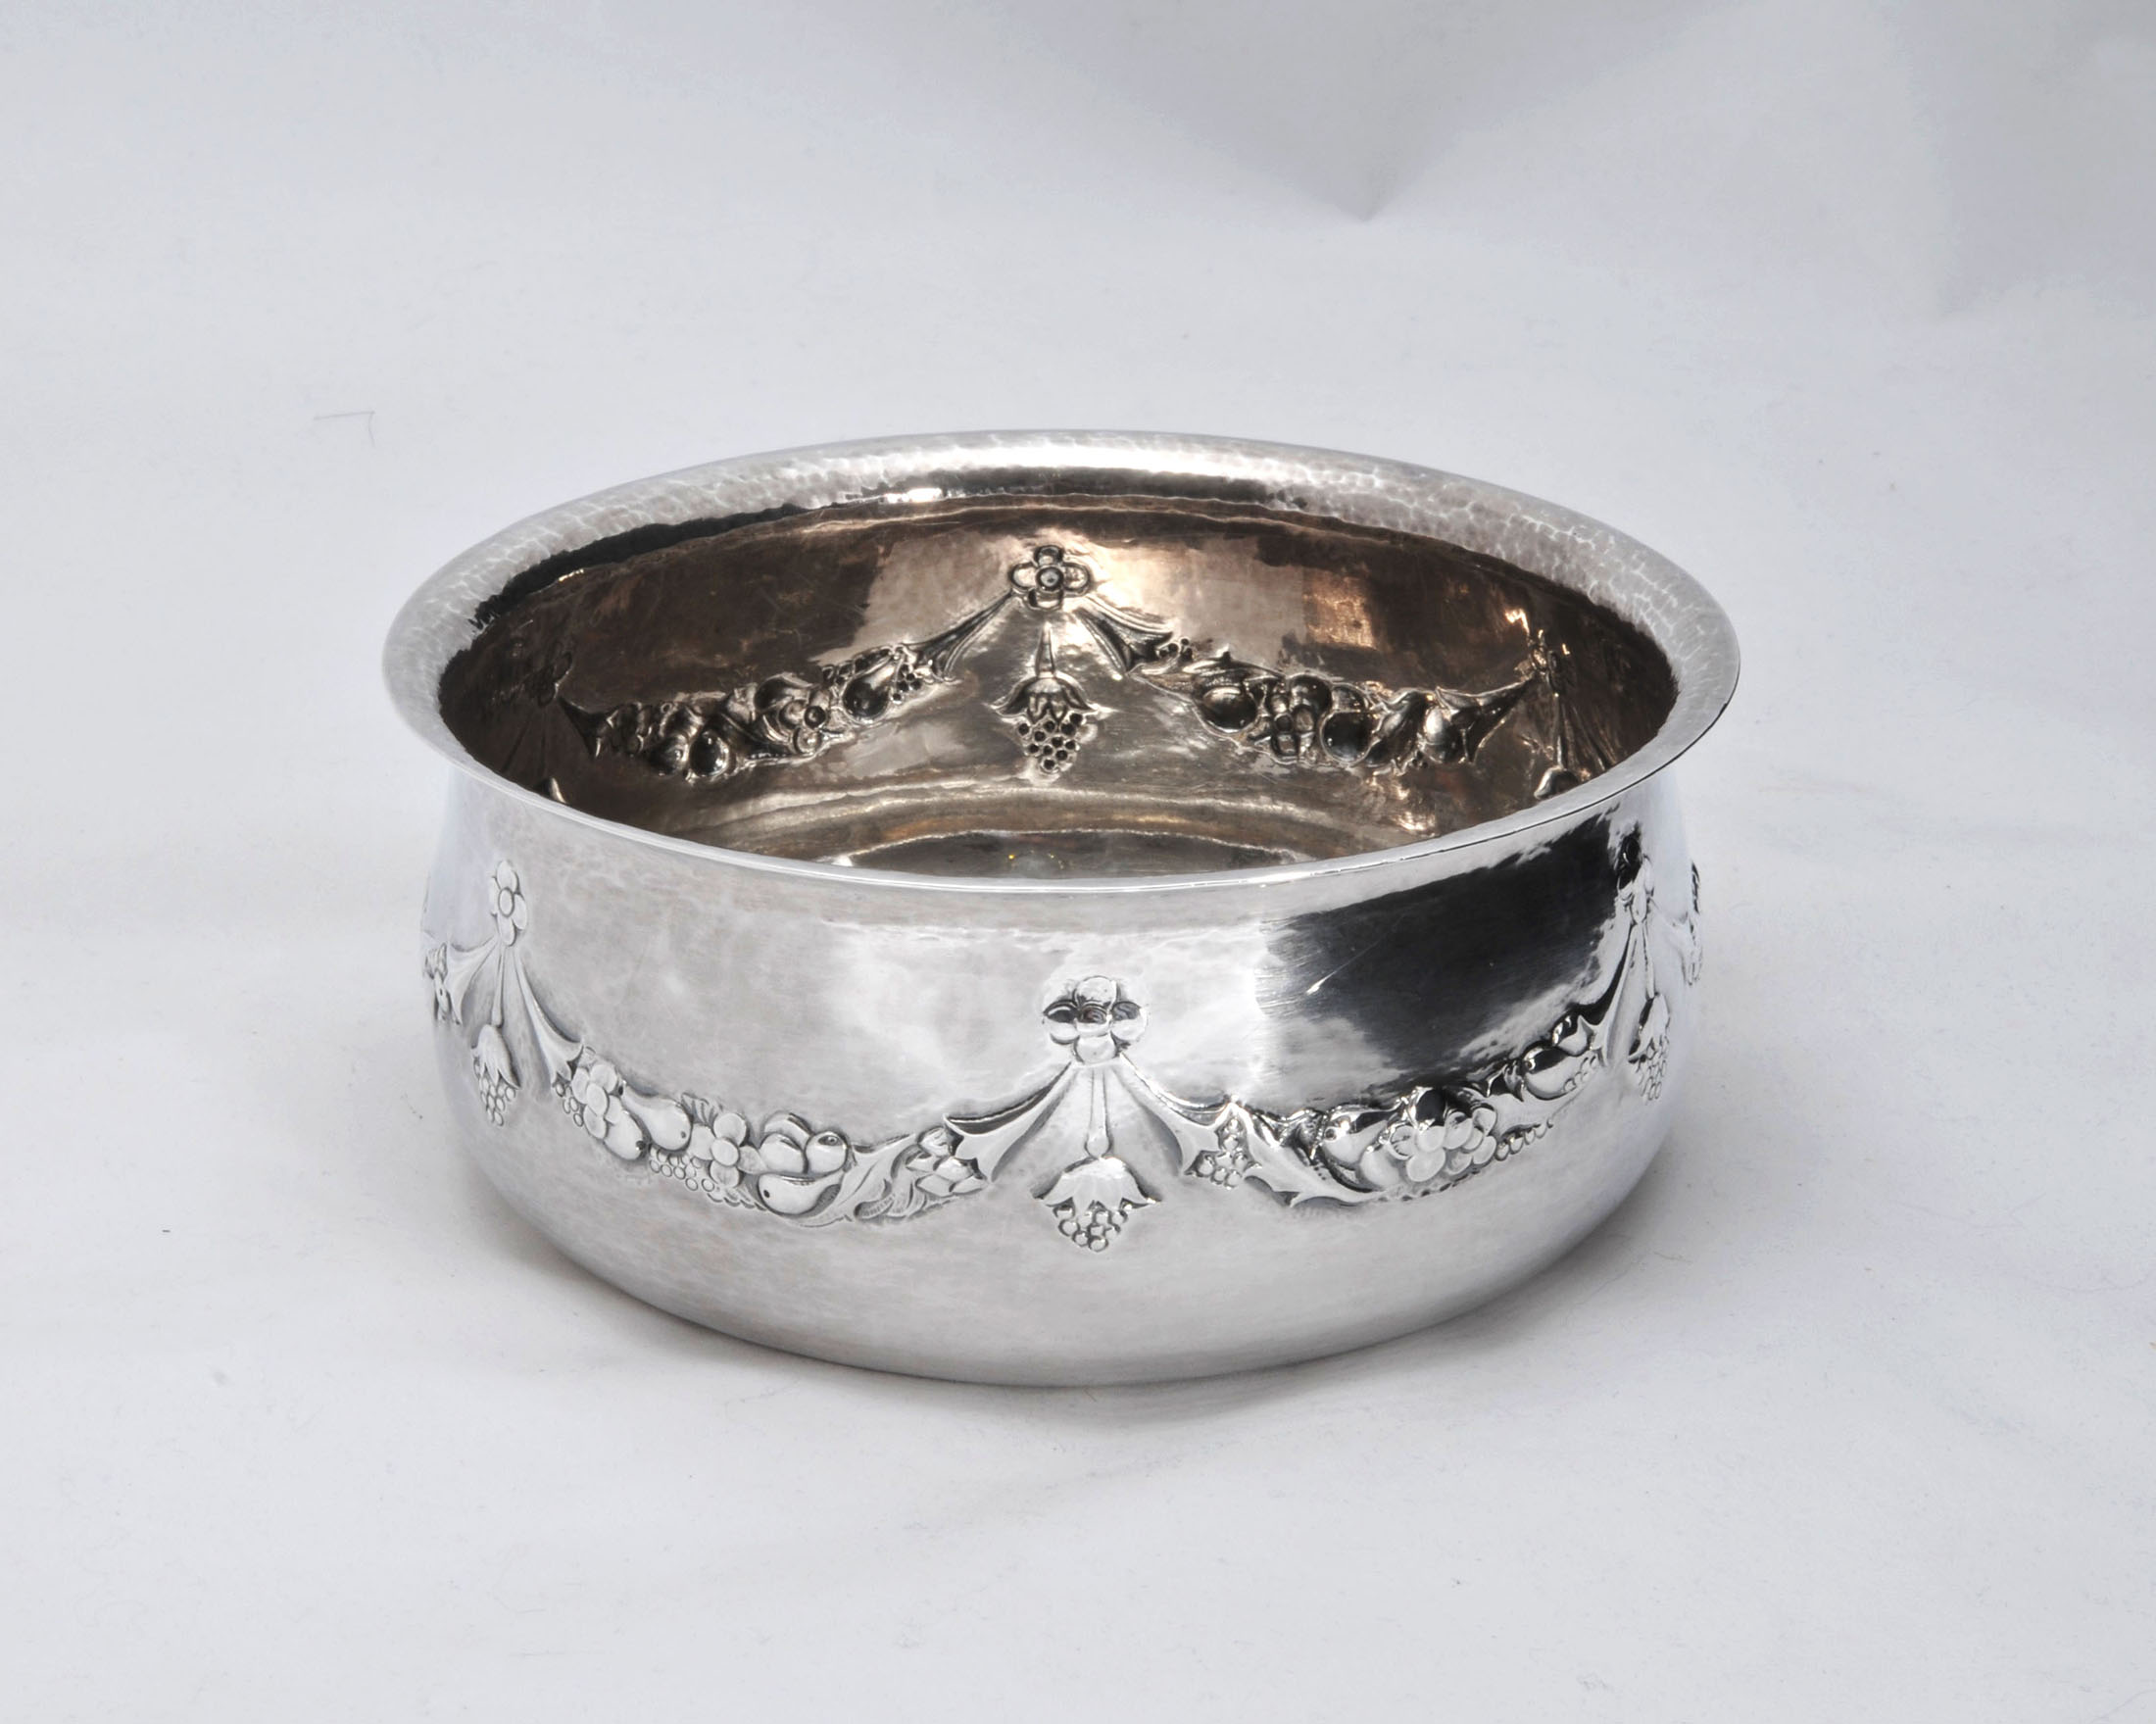 Guild of Handicraft flower bowl